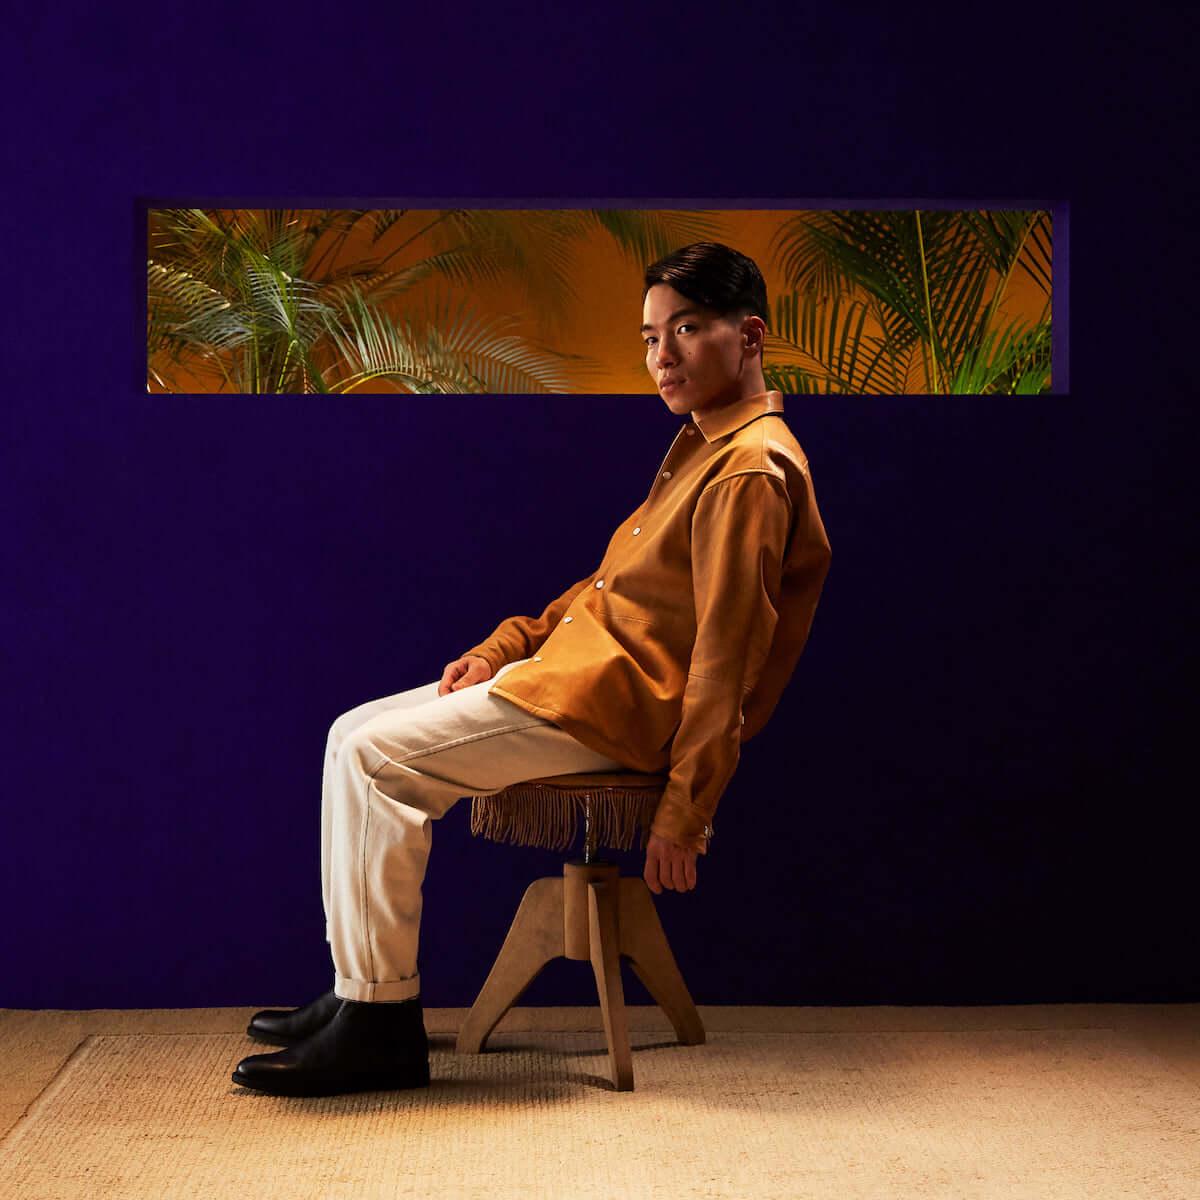 SIRUP、自身初のフルアルバム『FEEL GOOD』を発表!アートワークとトラックリスト公開 music190409_sirup_main-1200x1200